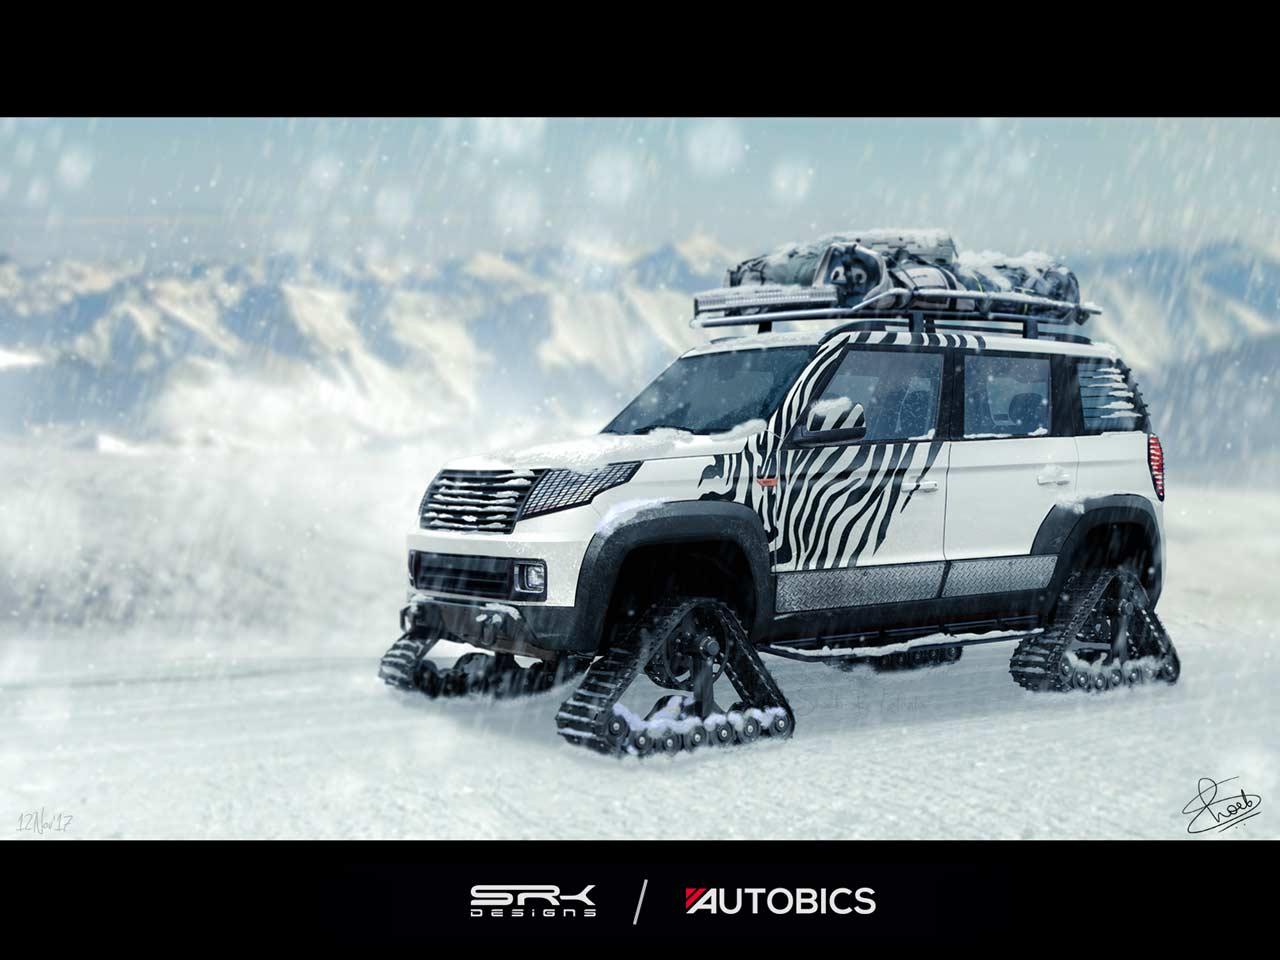 Snow Warrior - Mahindra TUV300 Modified with Snow Tracks